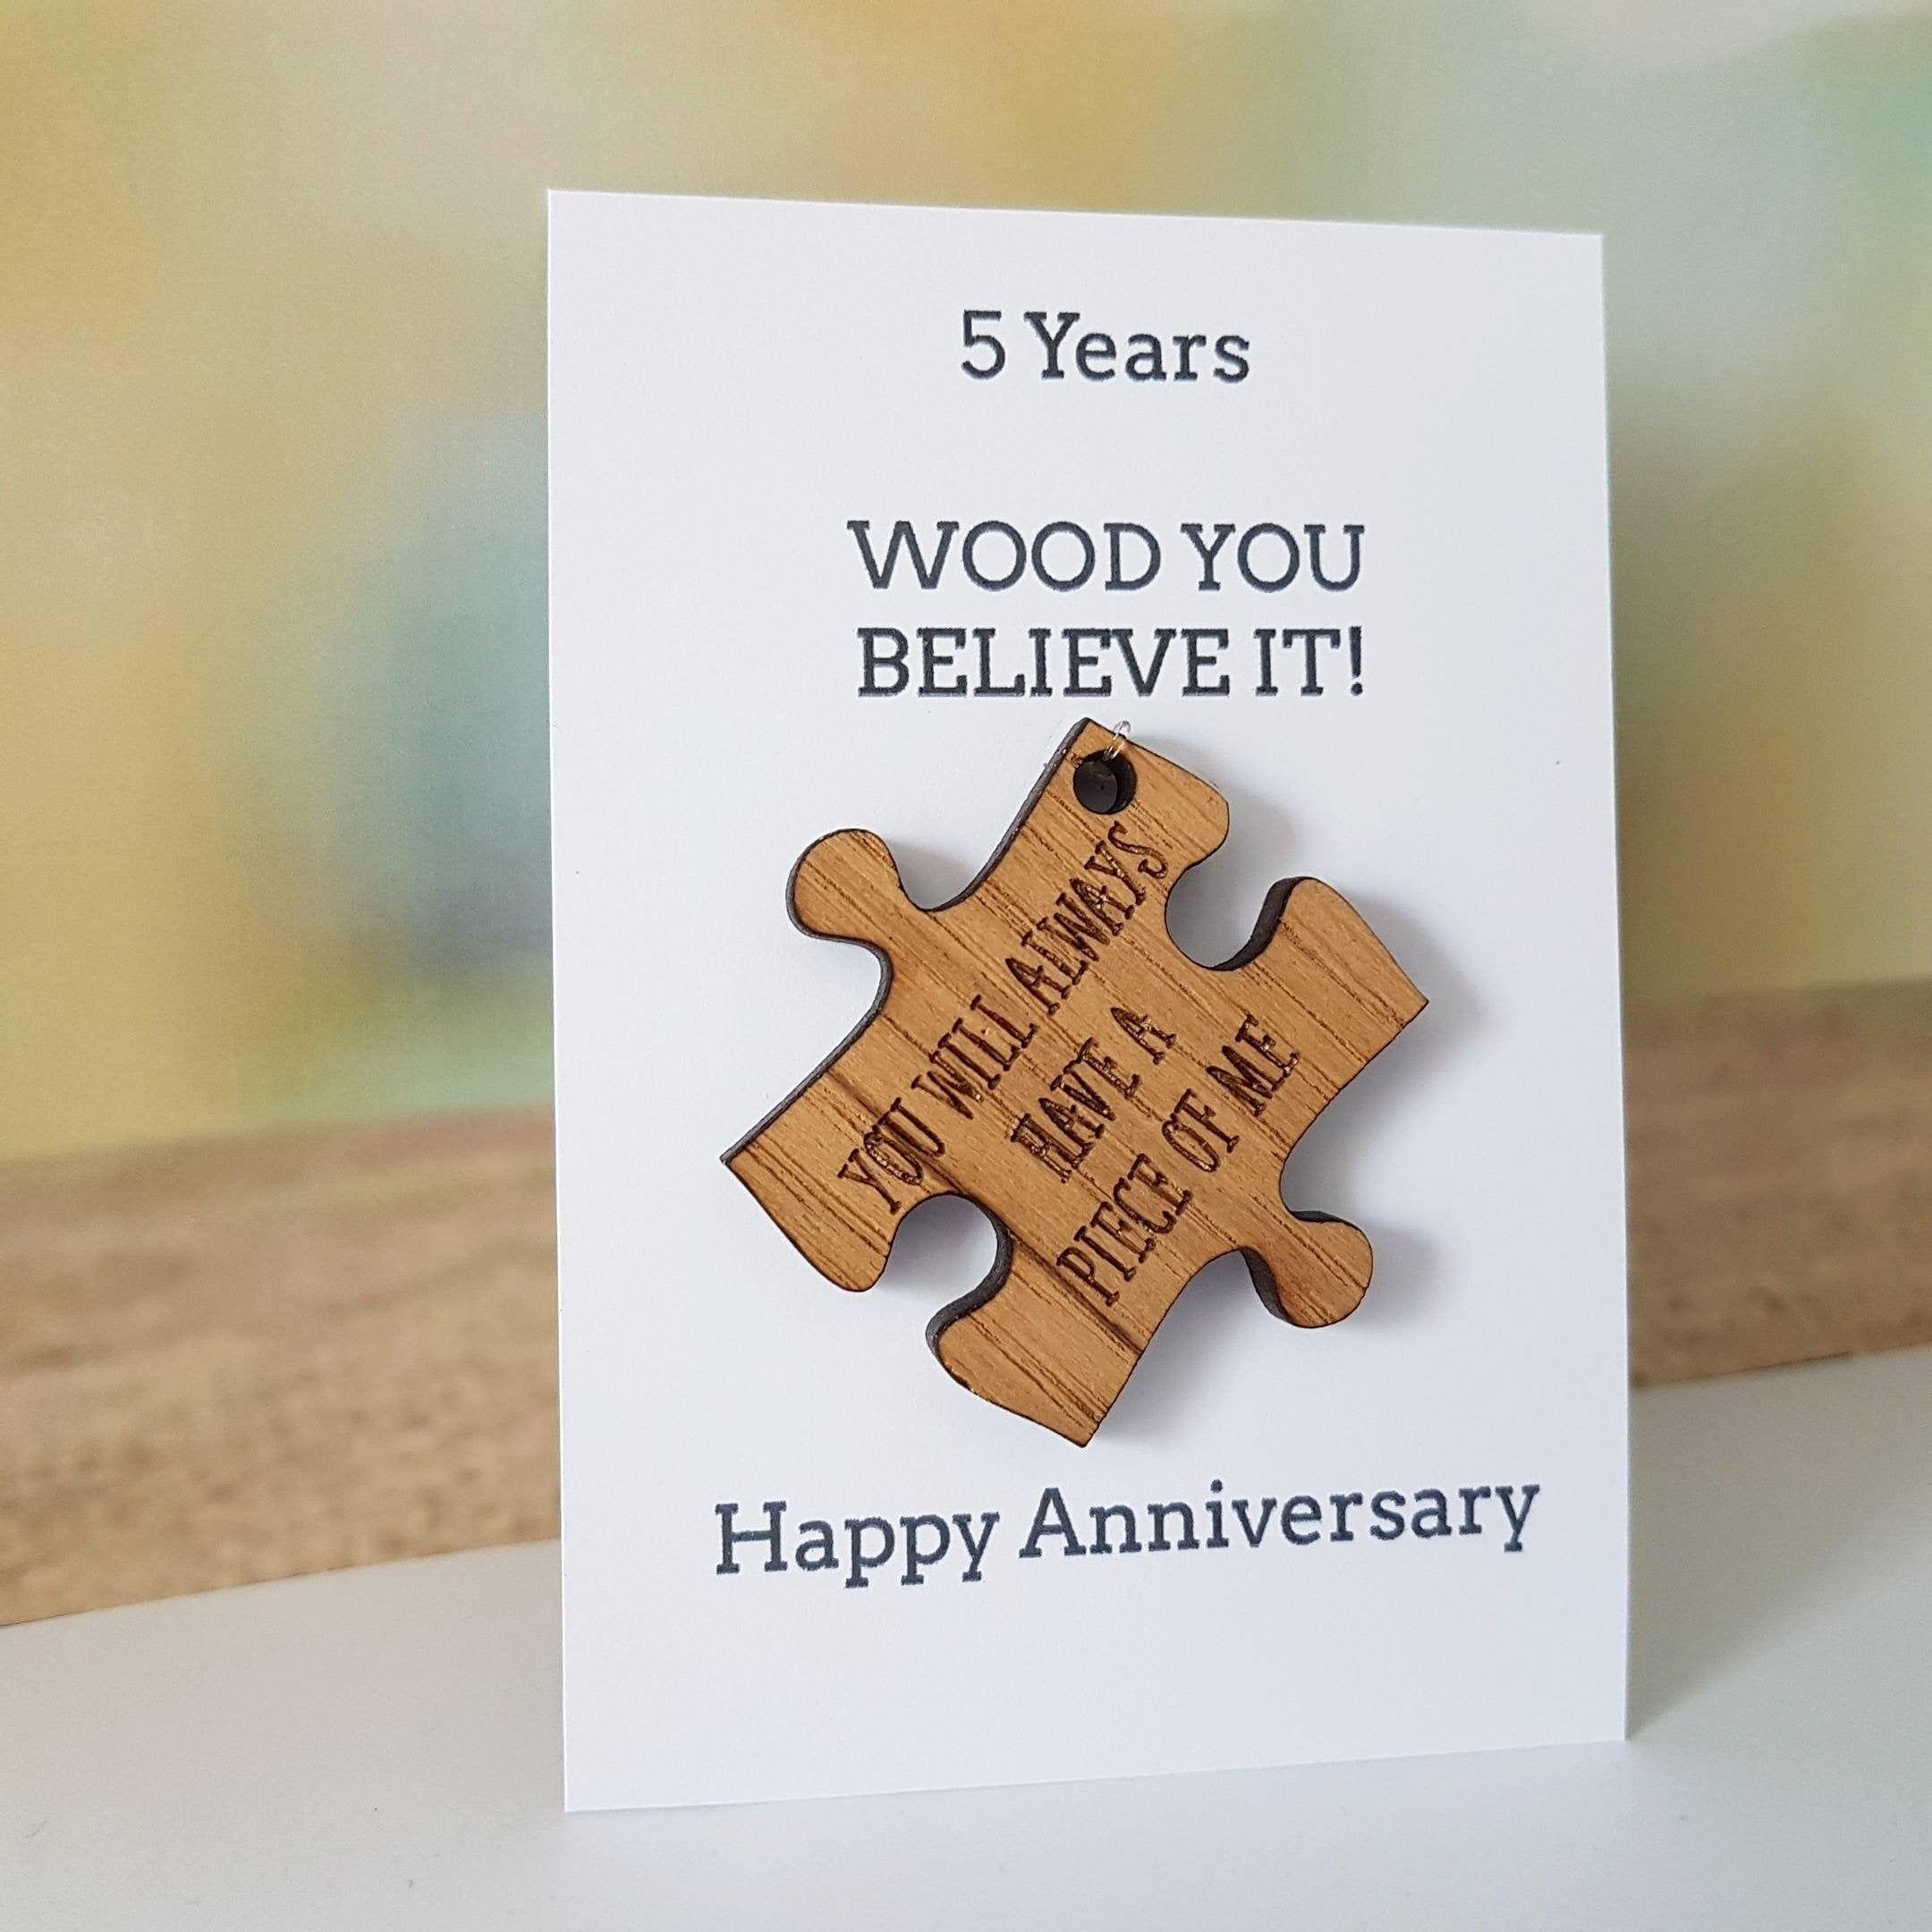 5th Anniversary Card, HusbandGift, Wife Card, Wood, Wooden